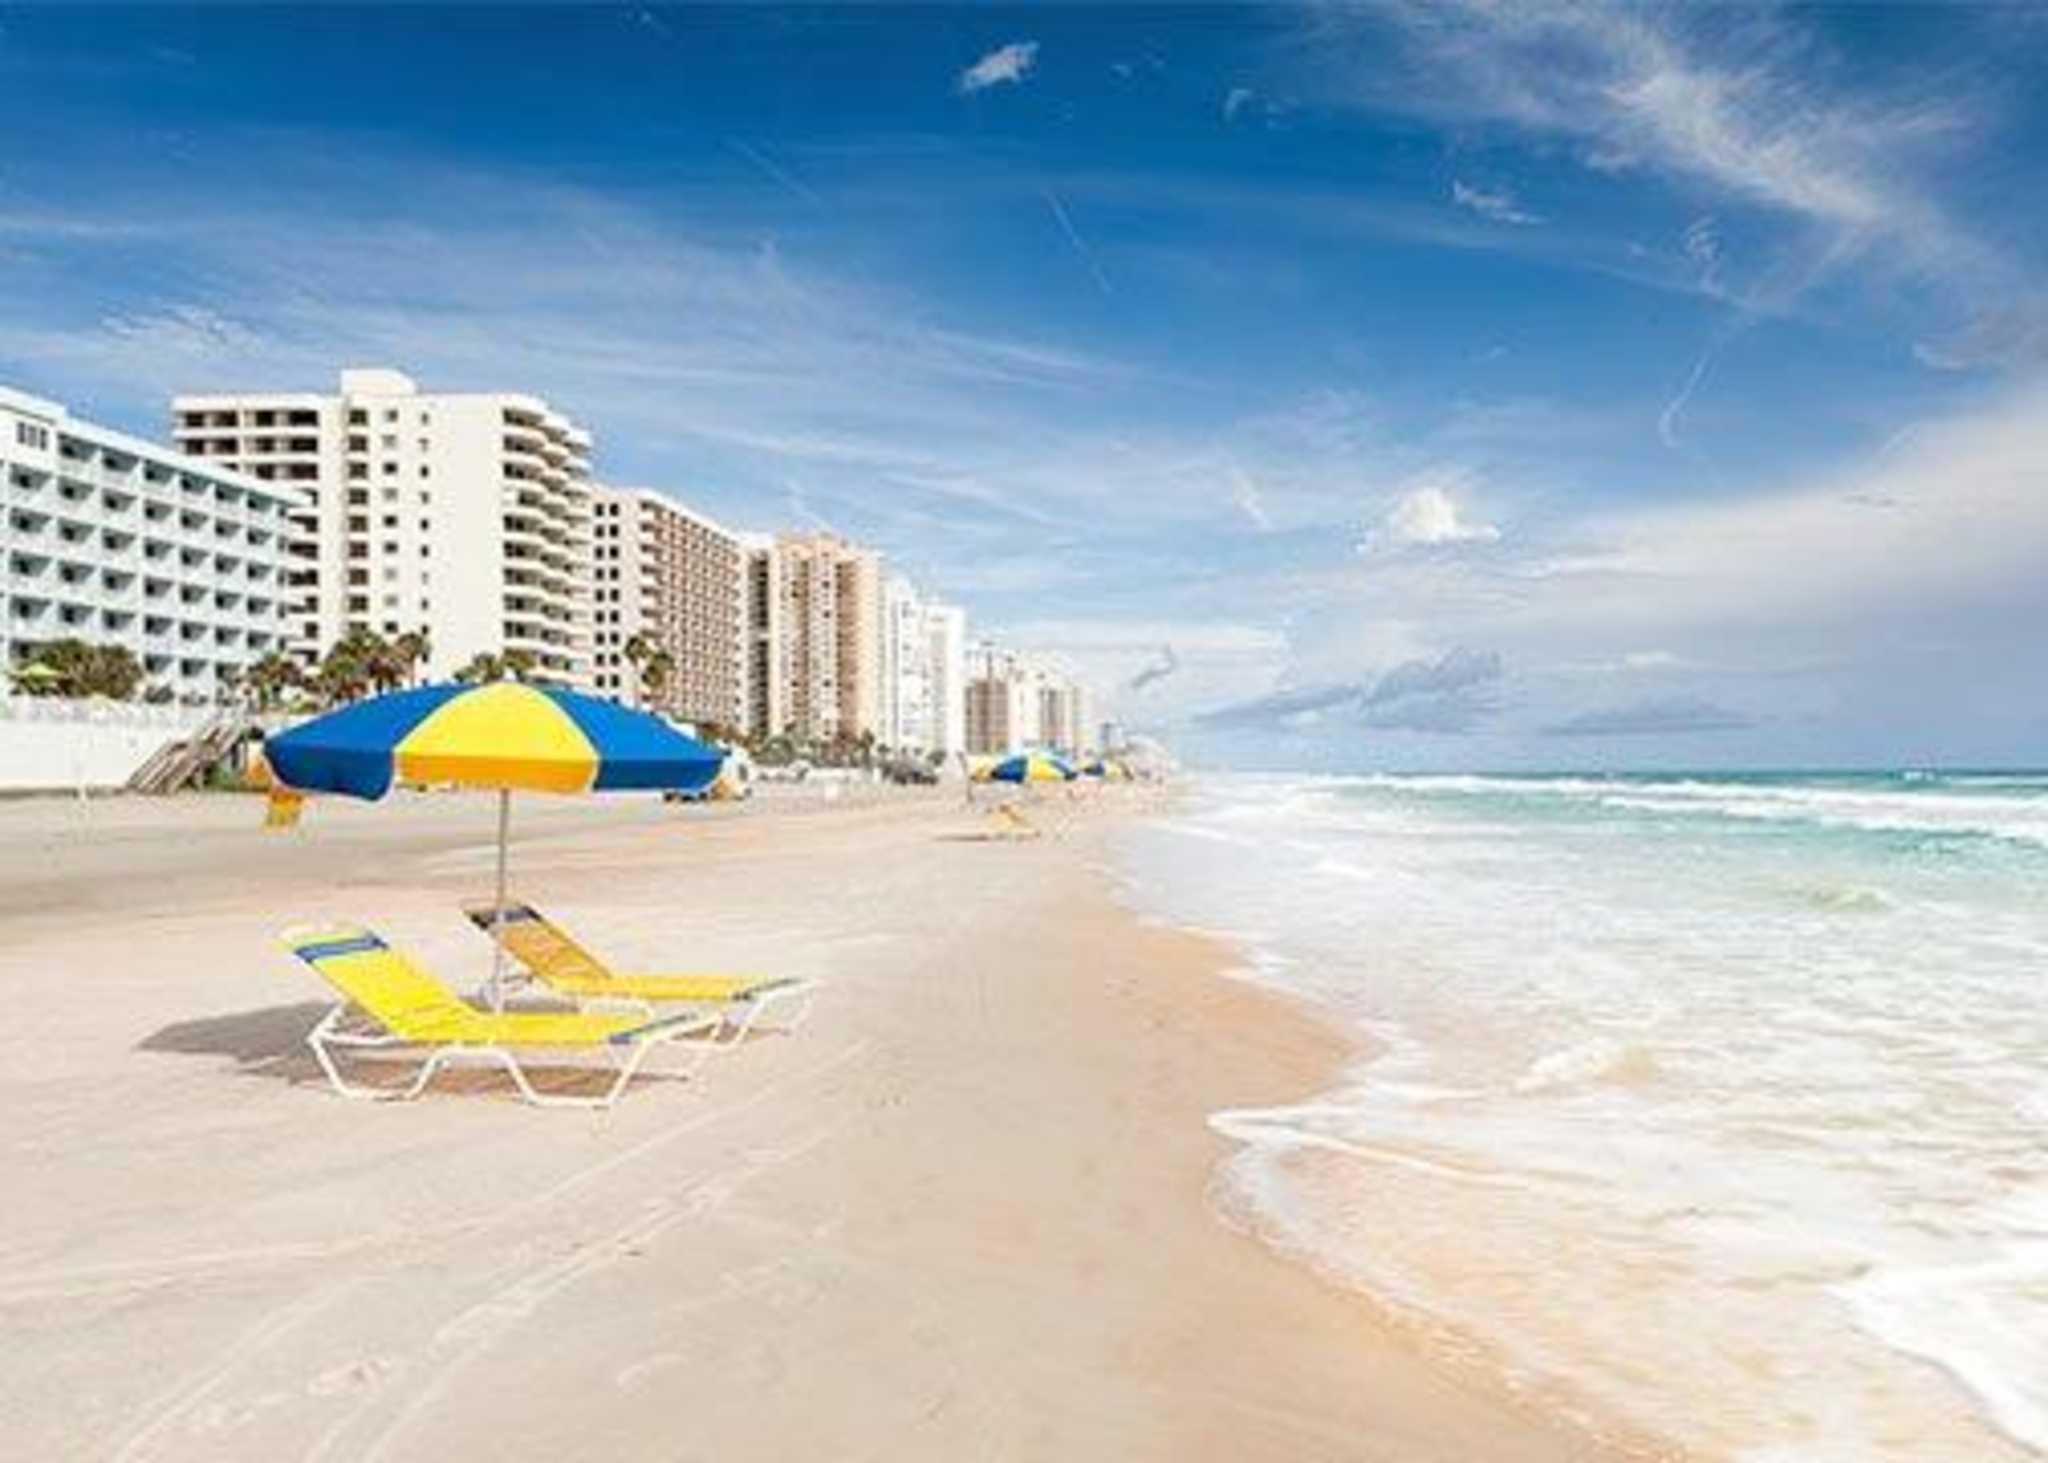 Dmv Daytona Beach Shores